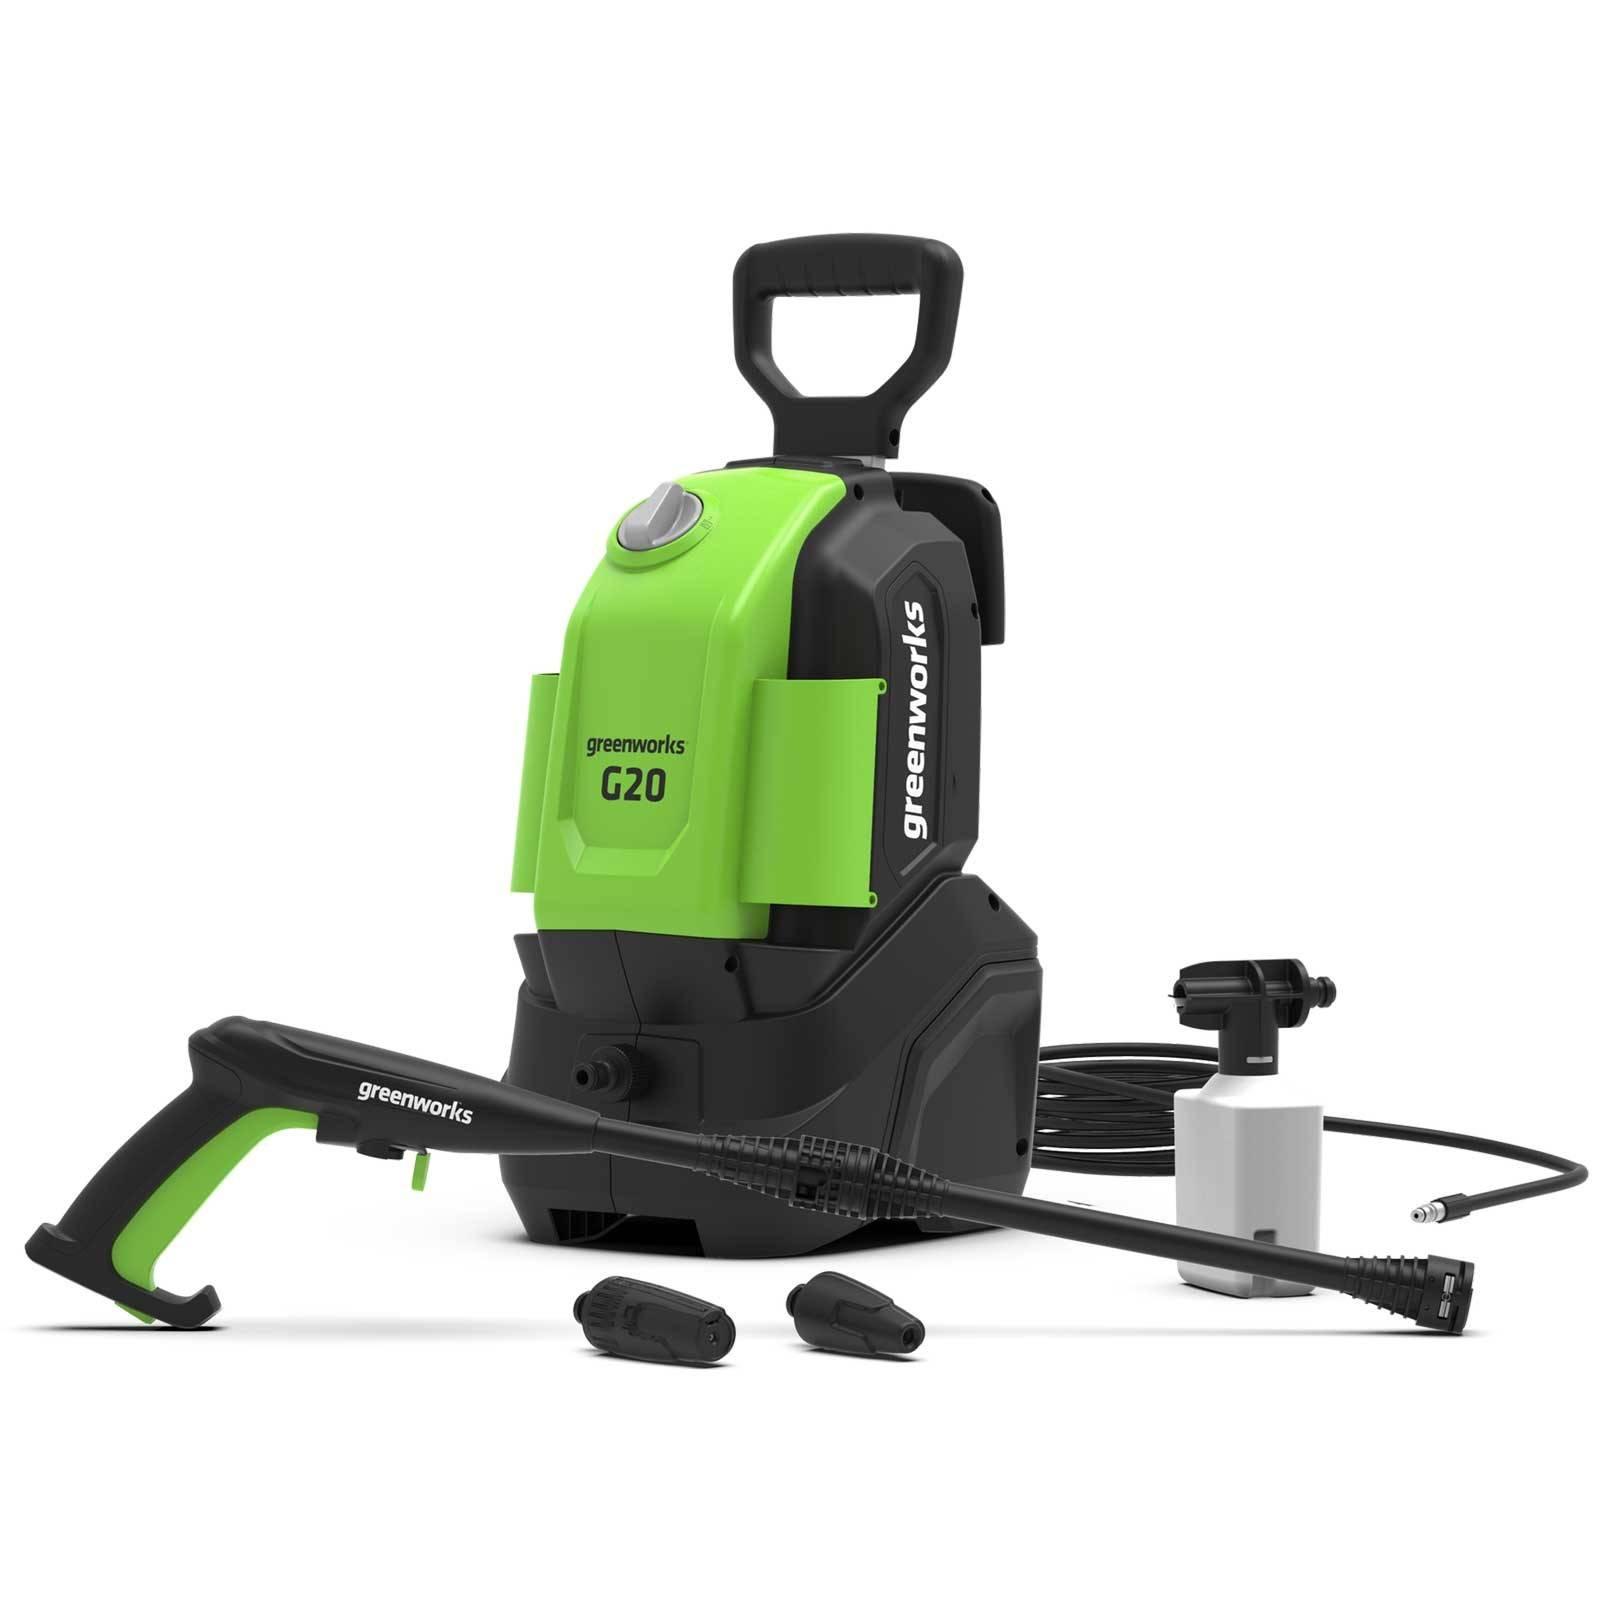 Greenworks G20 Pressure Washer with Patio Brush